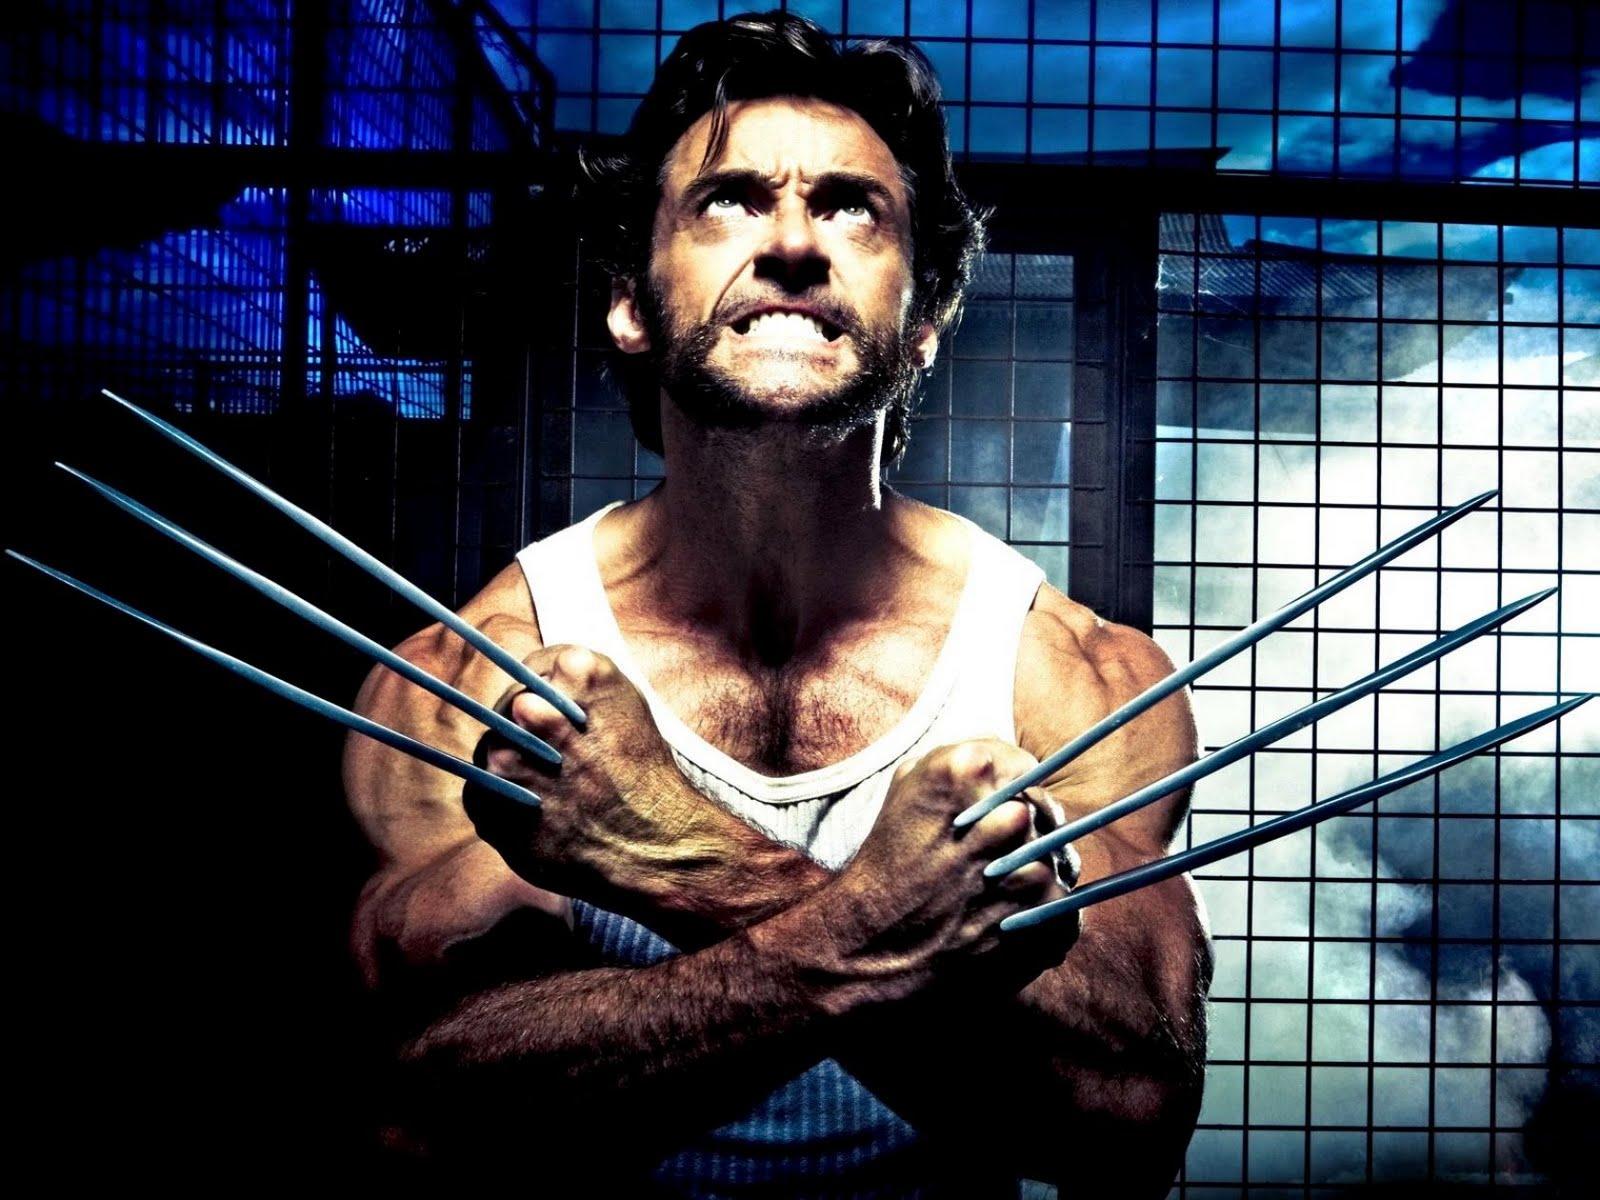 X Men 3 Wallpaper Wolverine X Men High Q...